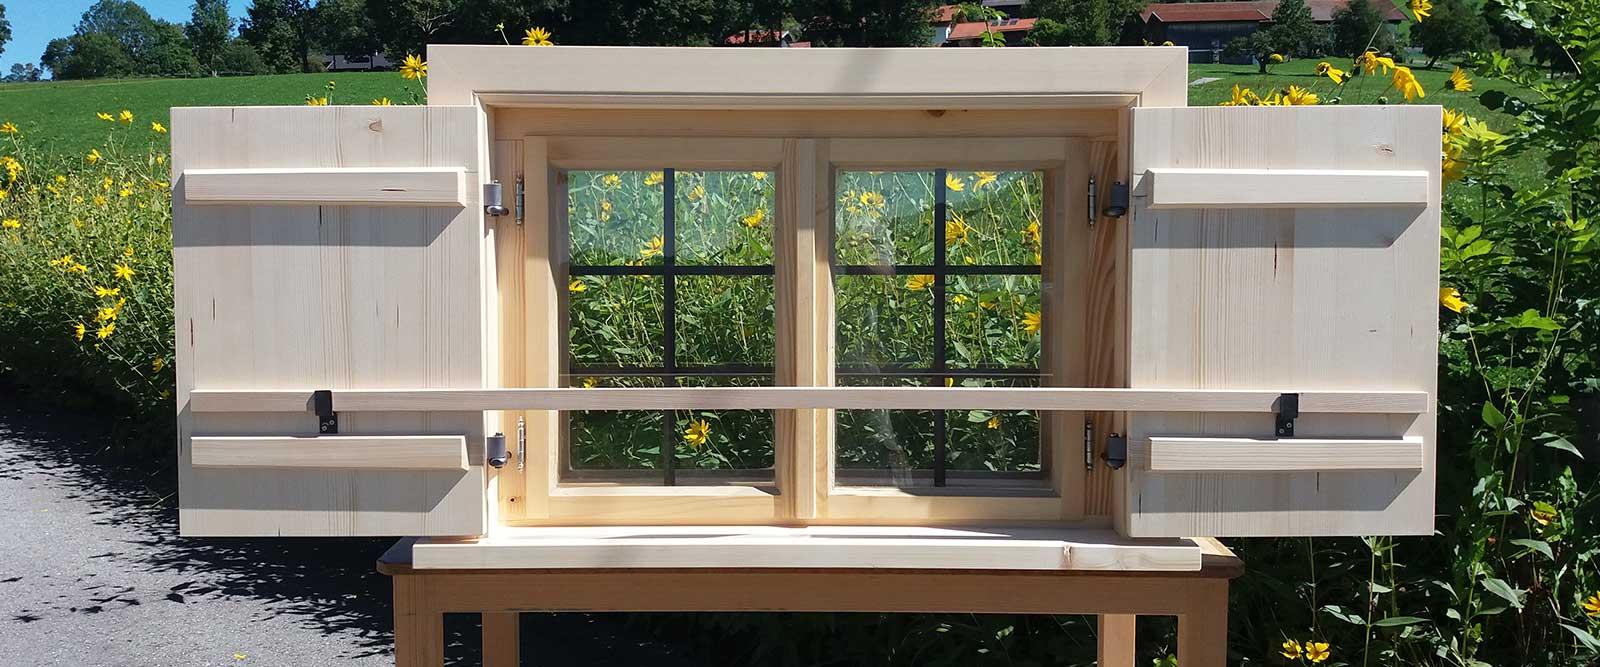 Fenster & Türen: Johann Kafl, Möbelschreinerei